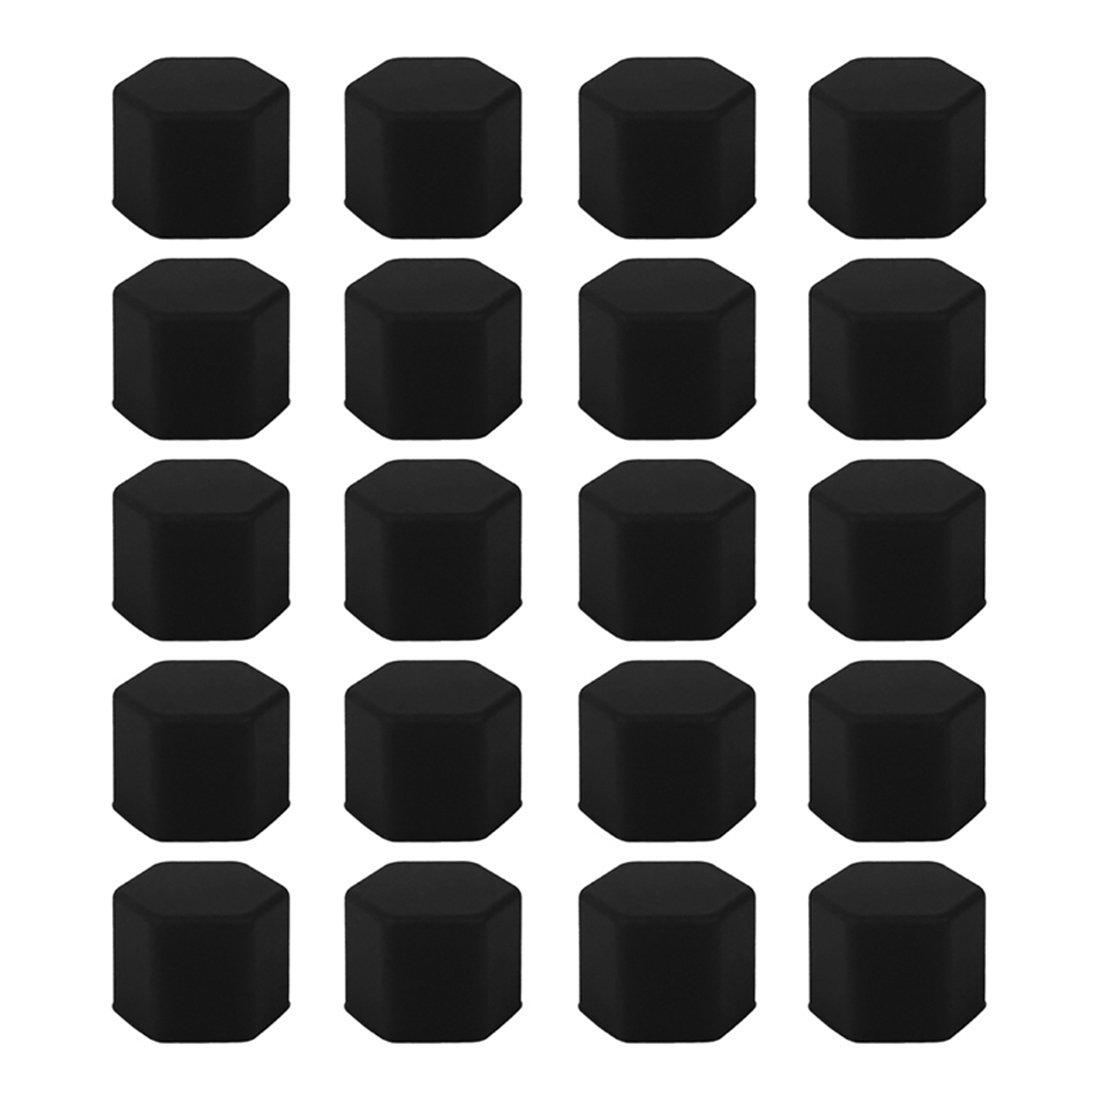 Andux Land Wheel Lug Nut Covers Silicone 21mm 20PCS LSBHT-01 Green